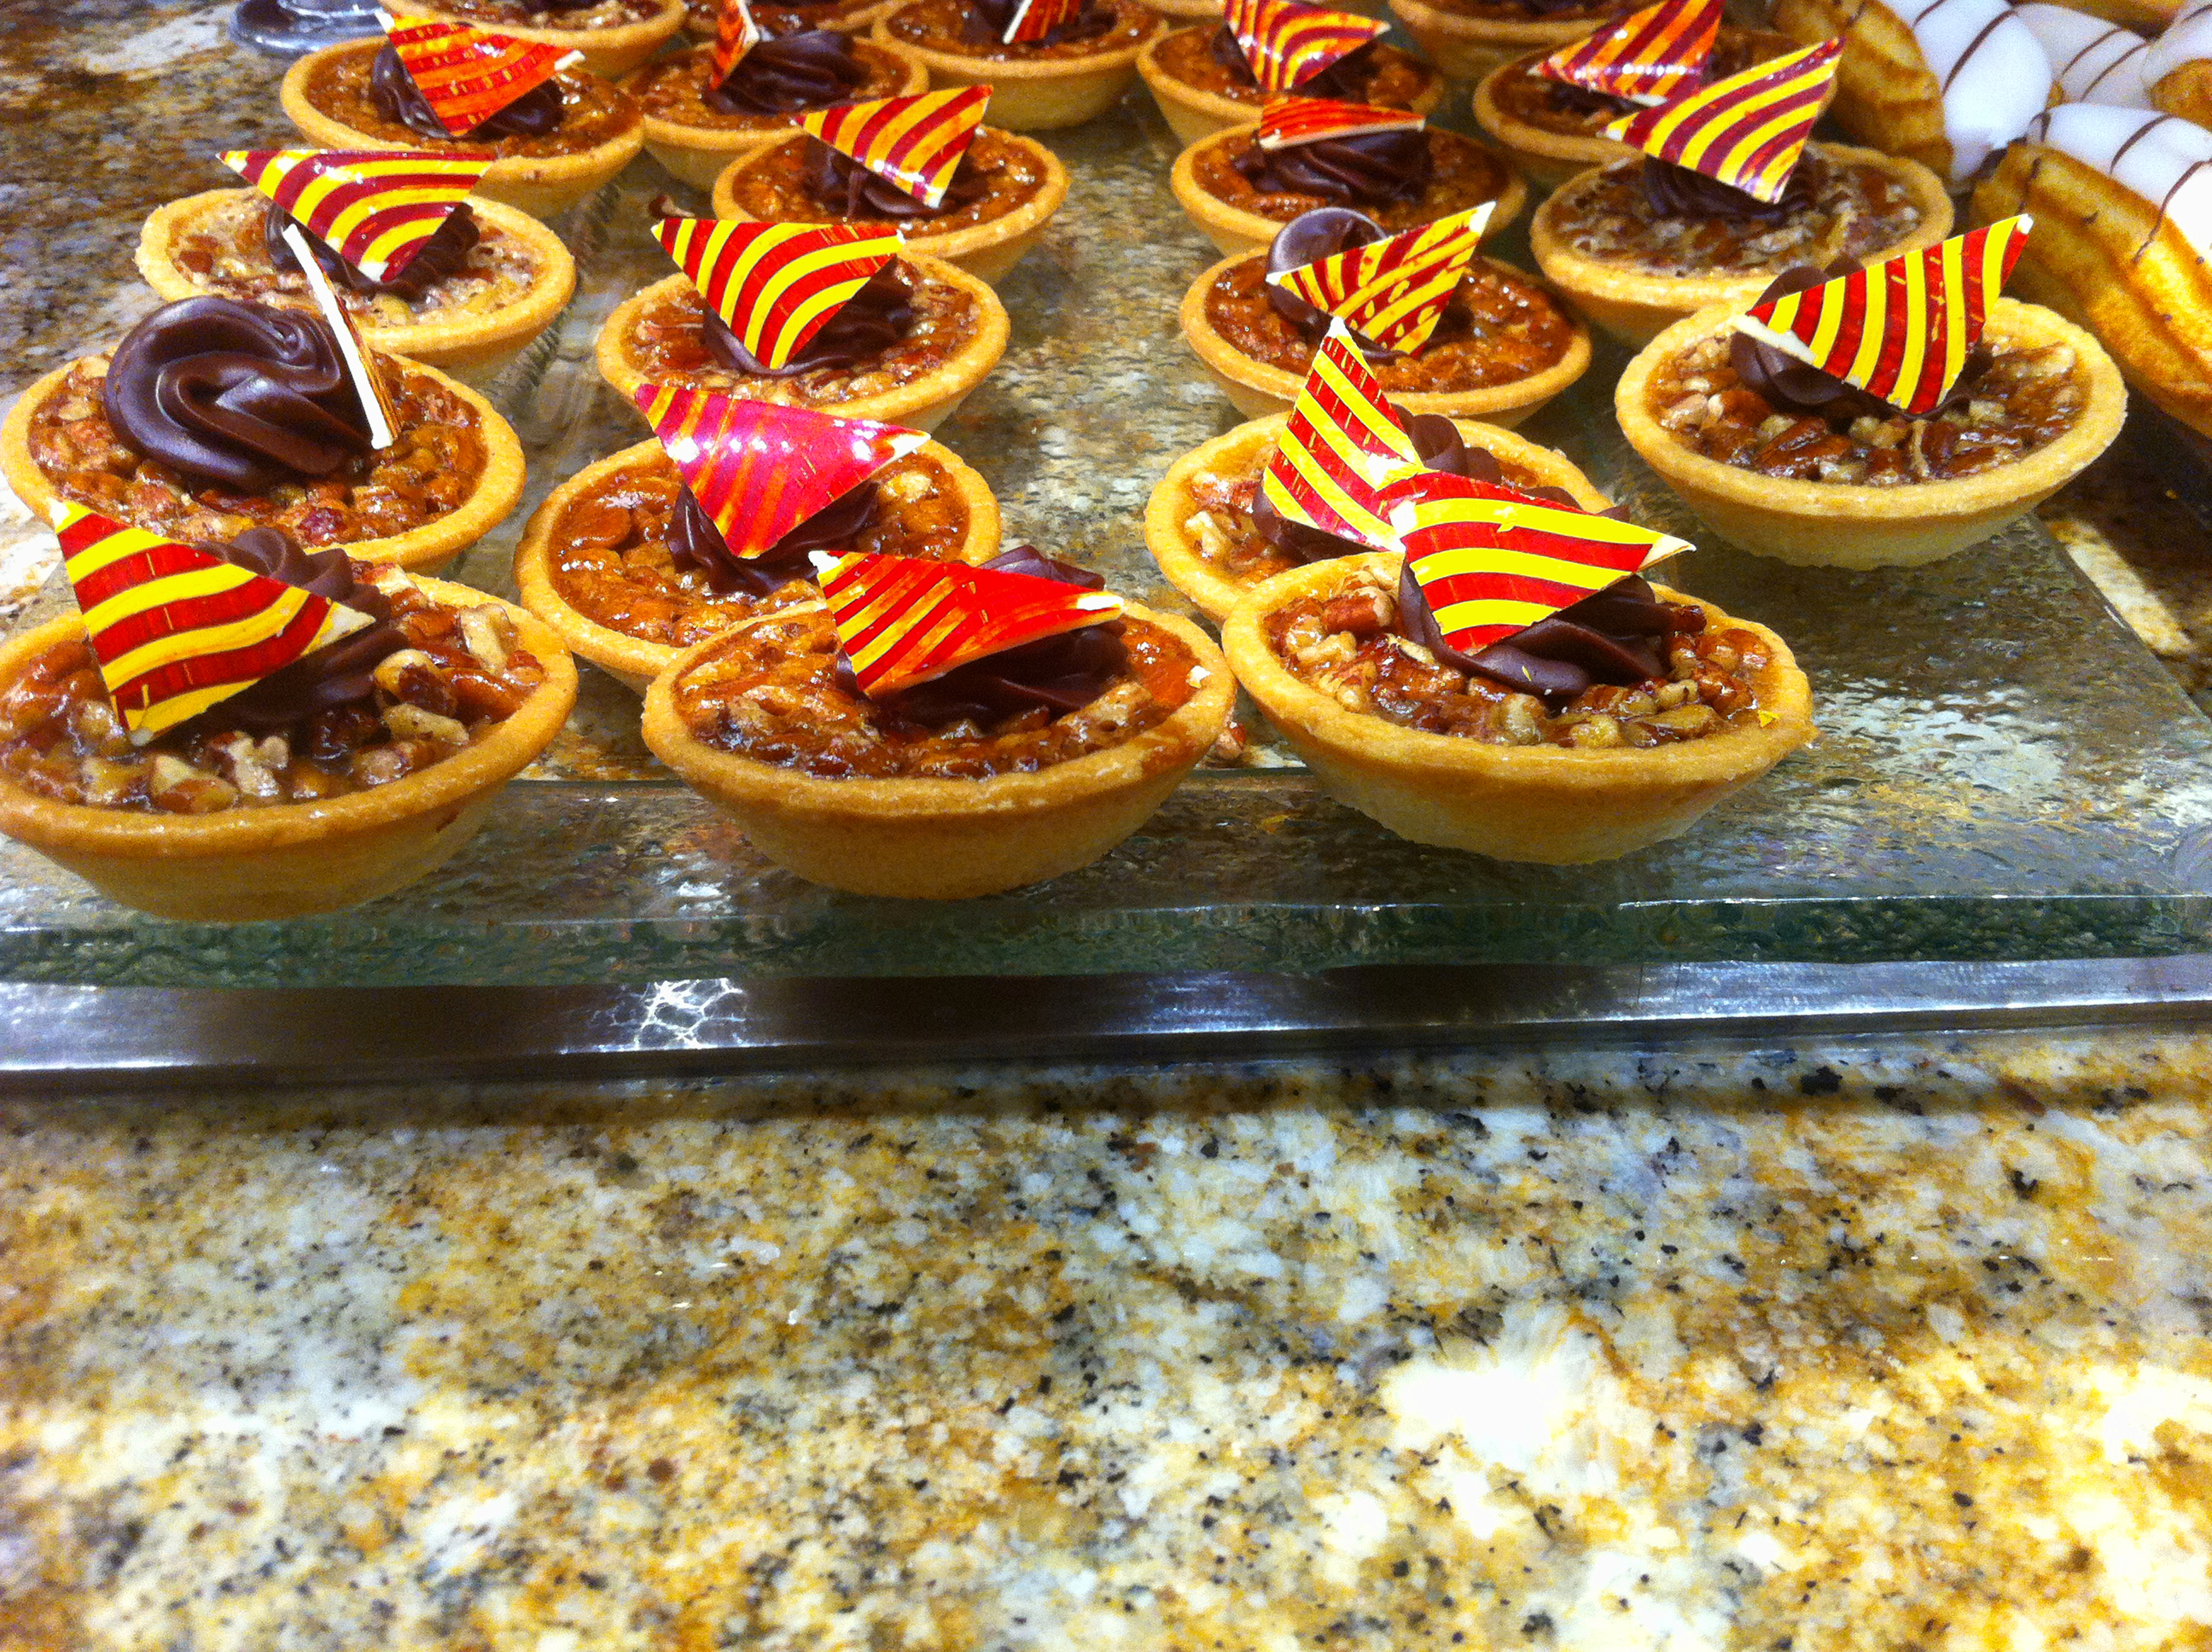 Fantastic Pecan Pies At The Bellagio Las Vegas Flavorful Home Interior And Landscaping Ologienasavecom